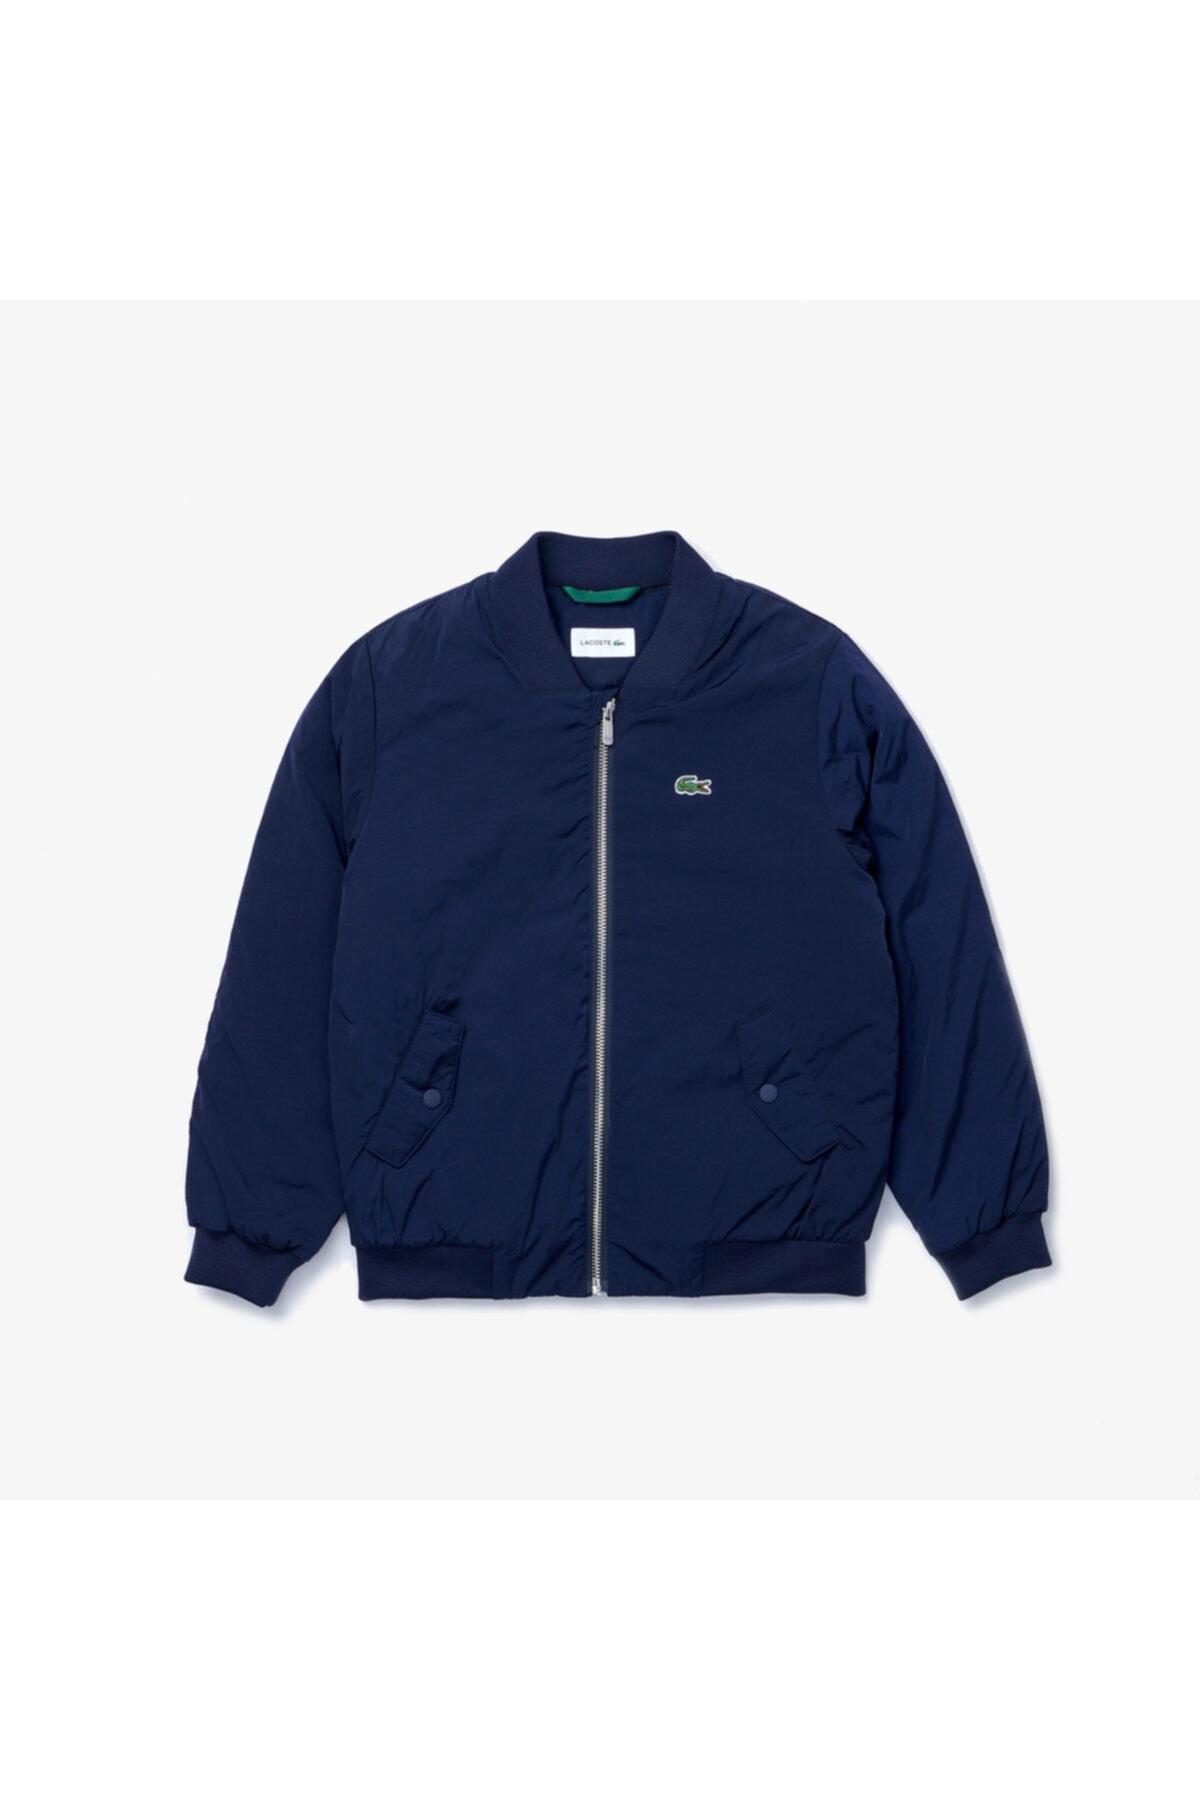 فروش پستی ژاکت پسرانه ترک برند لاگوست lacoste رنگ لاجوردی کد ty113273587